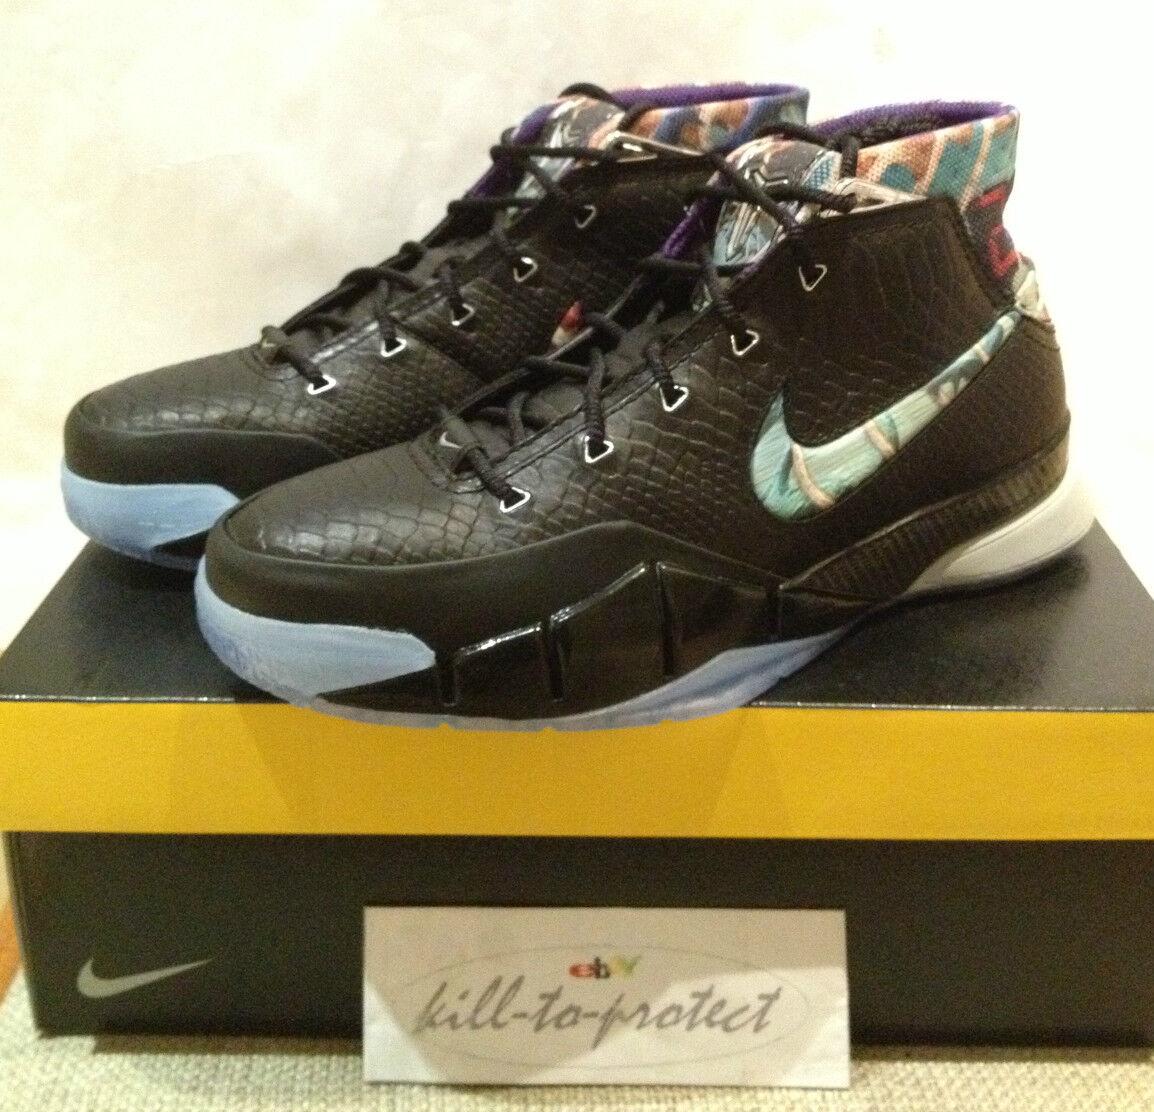 Nike kobe uno 1 preludio pack sz us9 uk8 htm 640221-001 come mvp 81 punti, 2013